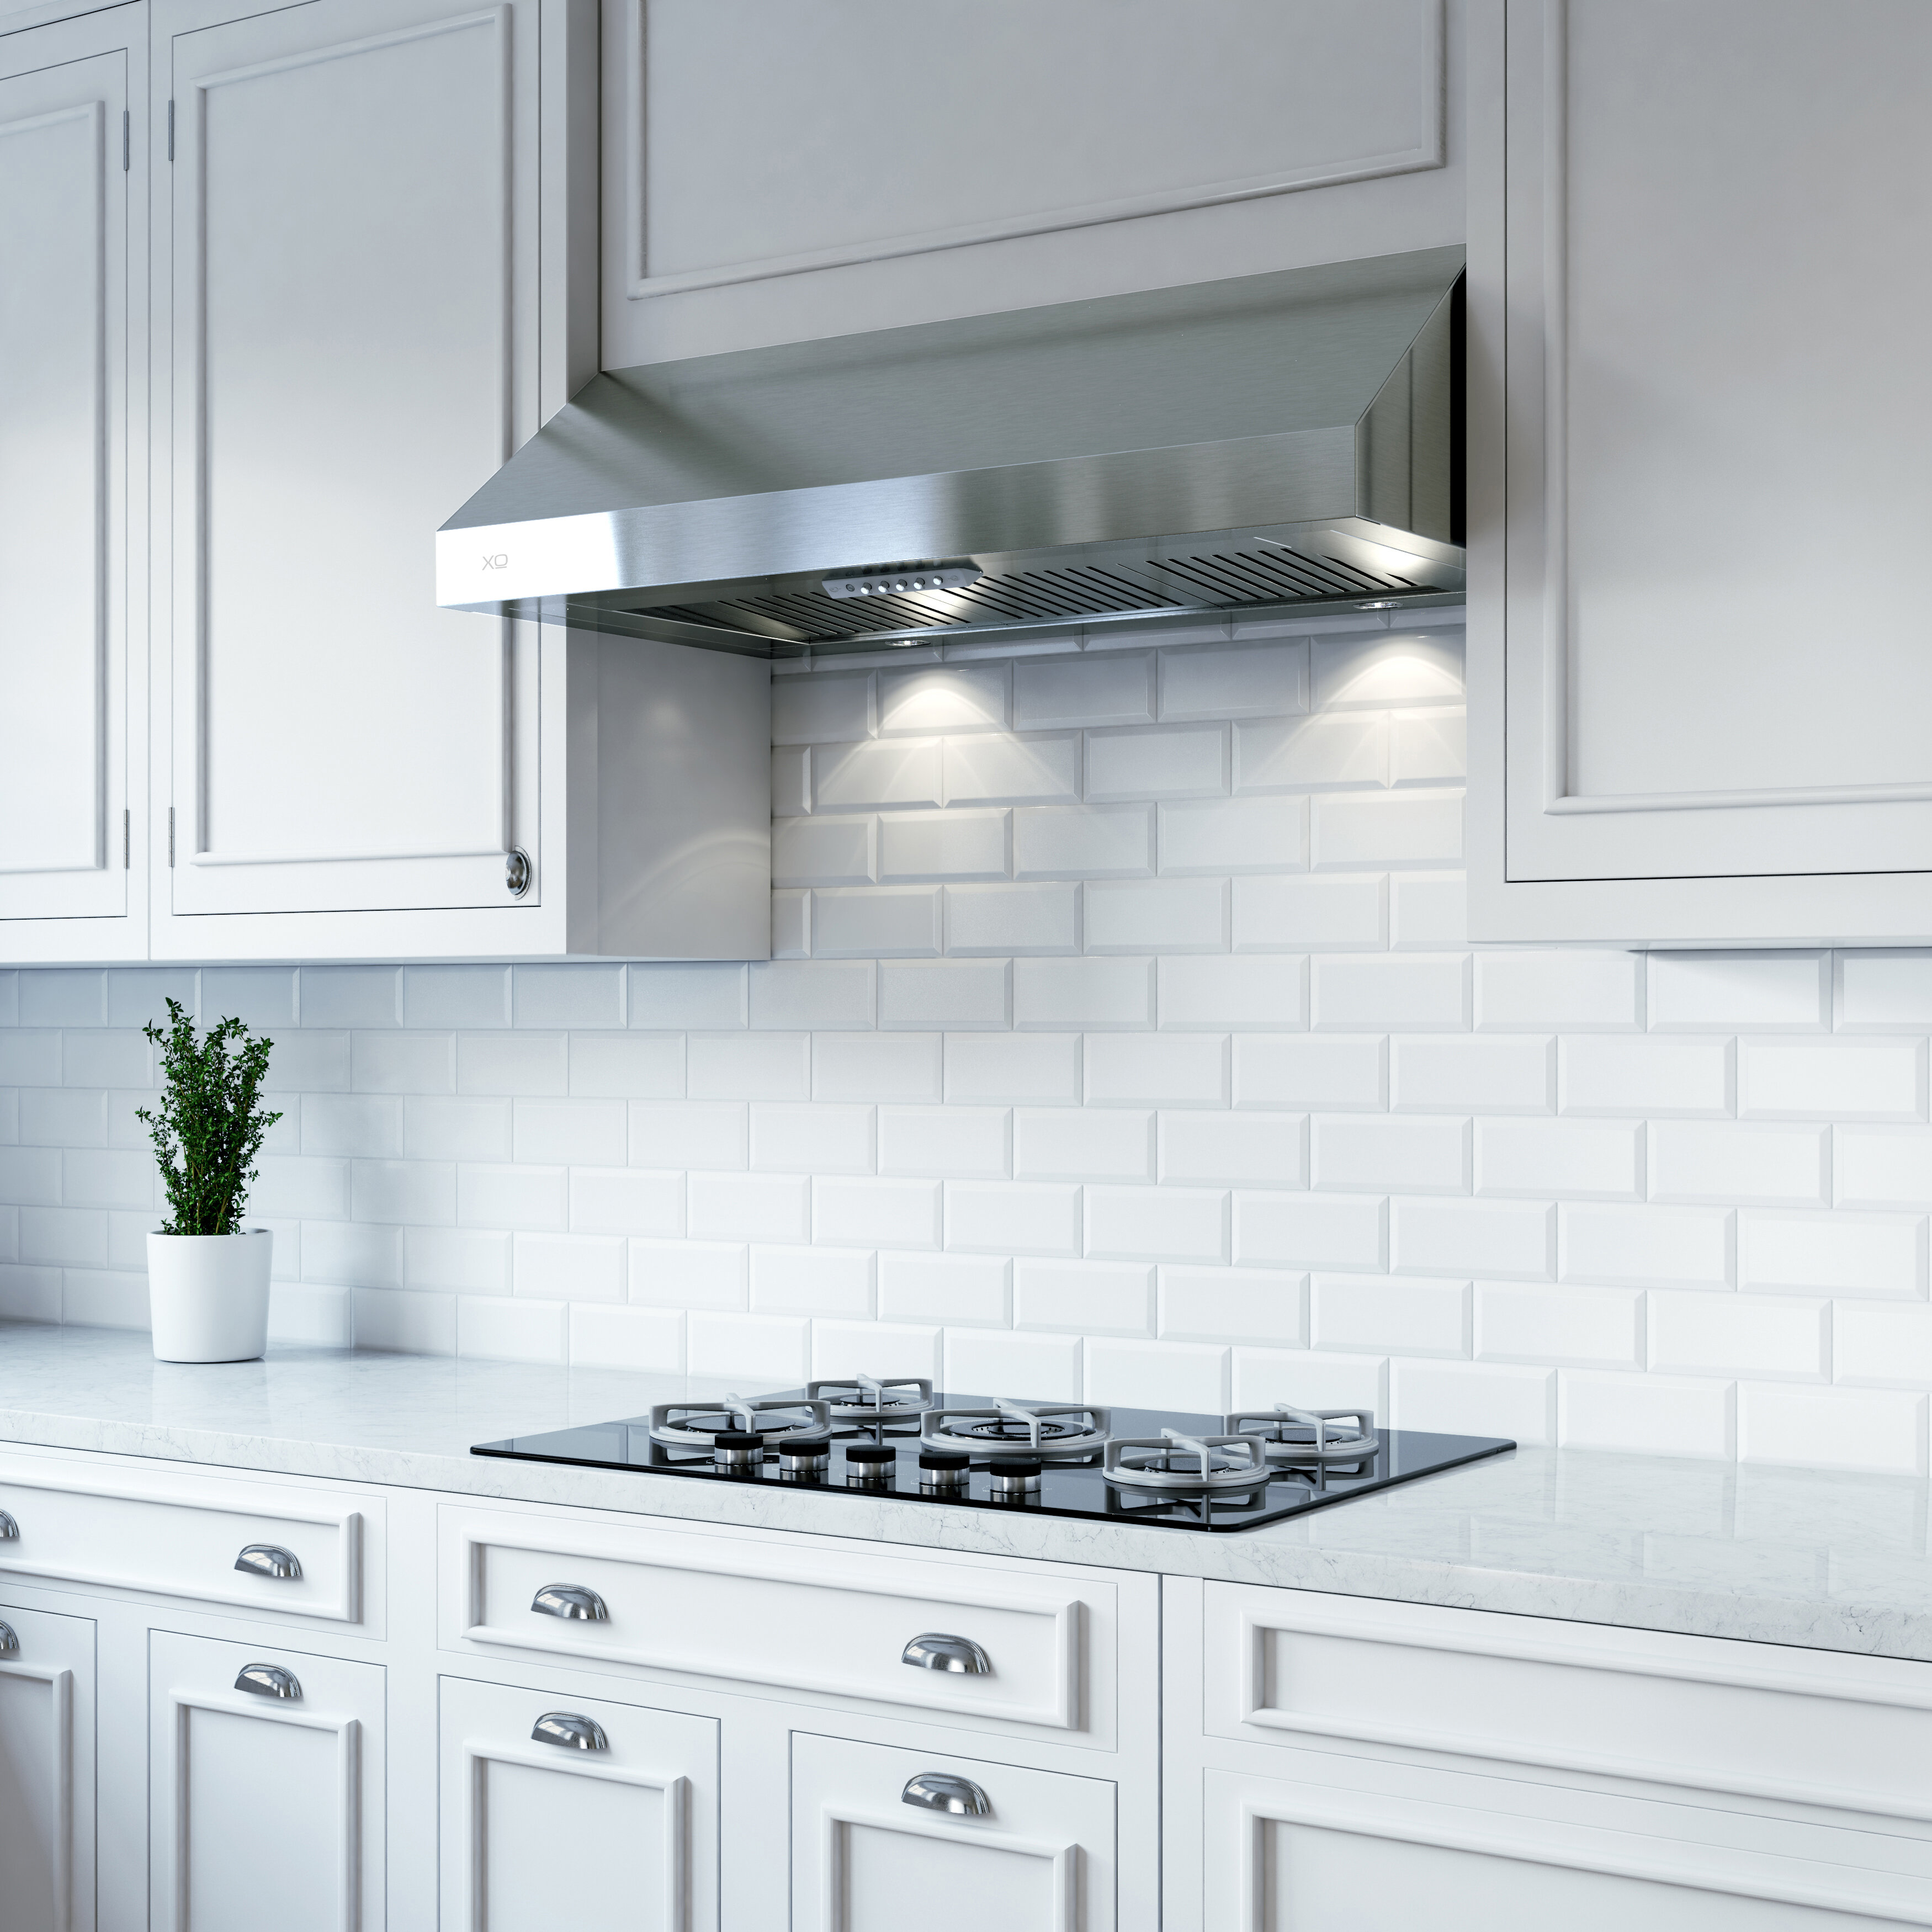 Xo Appliance 36 Fabriano 395 Cfm Convertible Under Cabinet Range Hood Reviews Wayfair